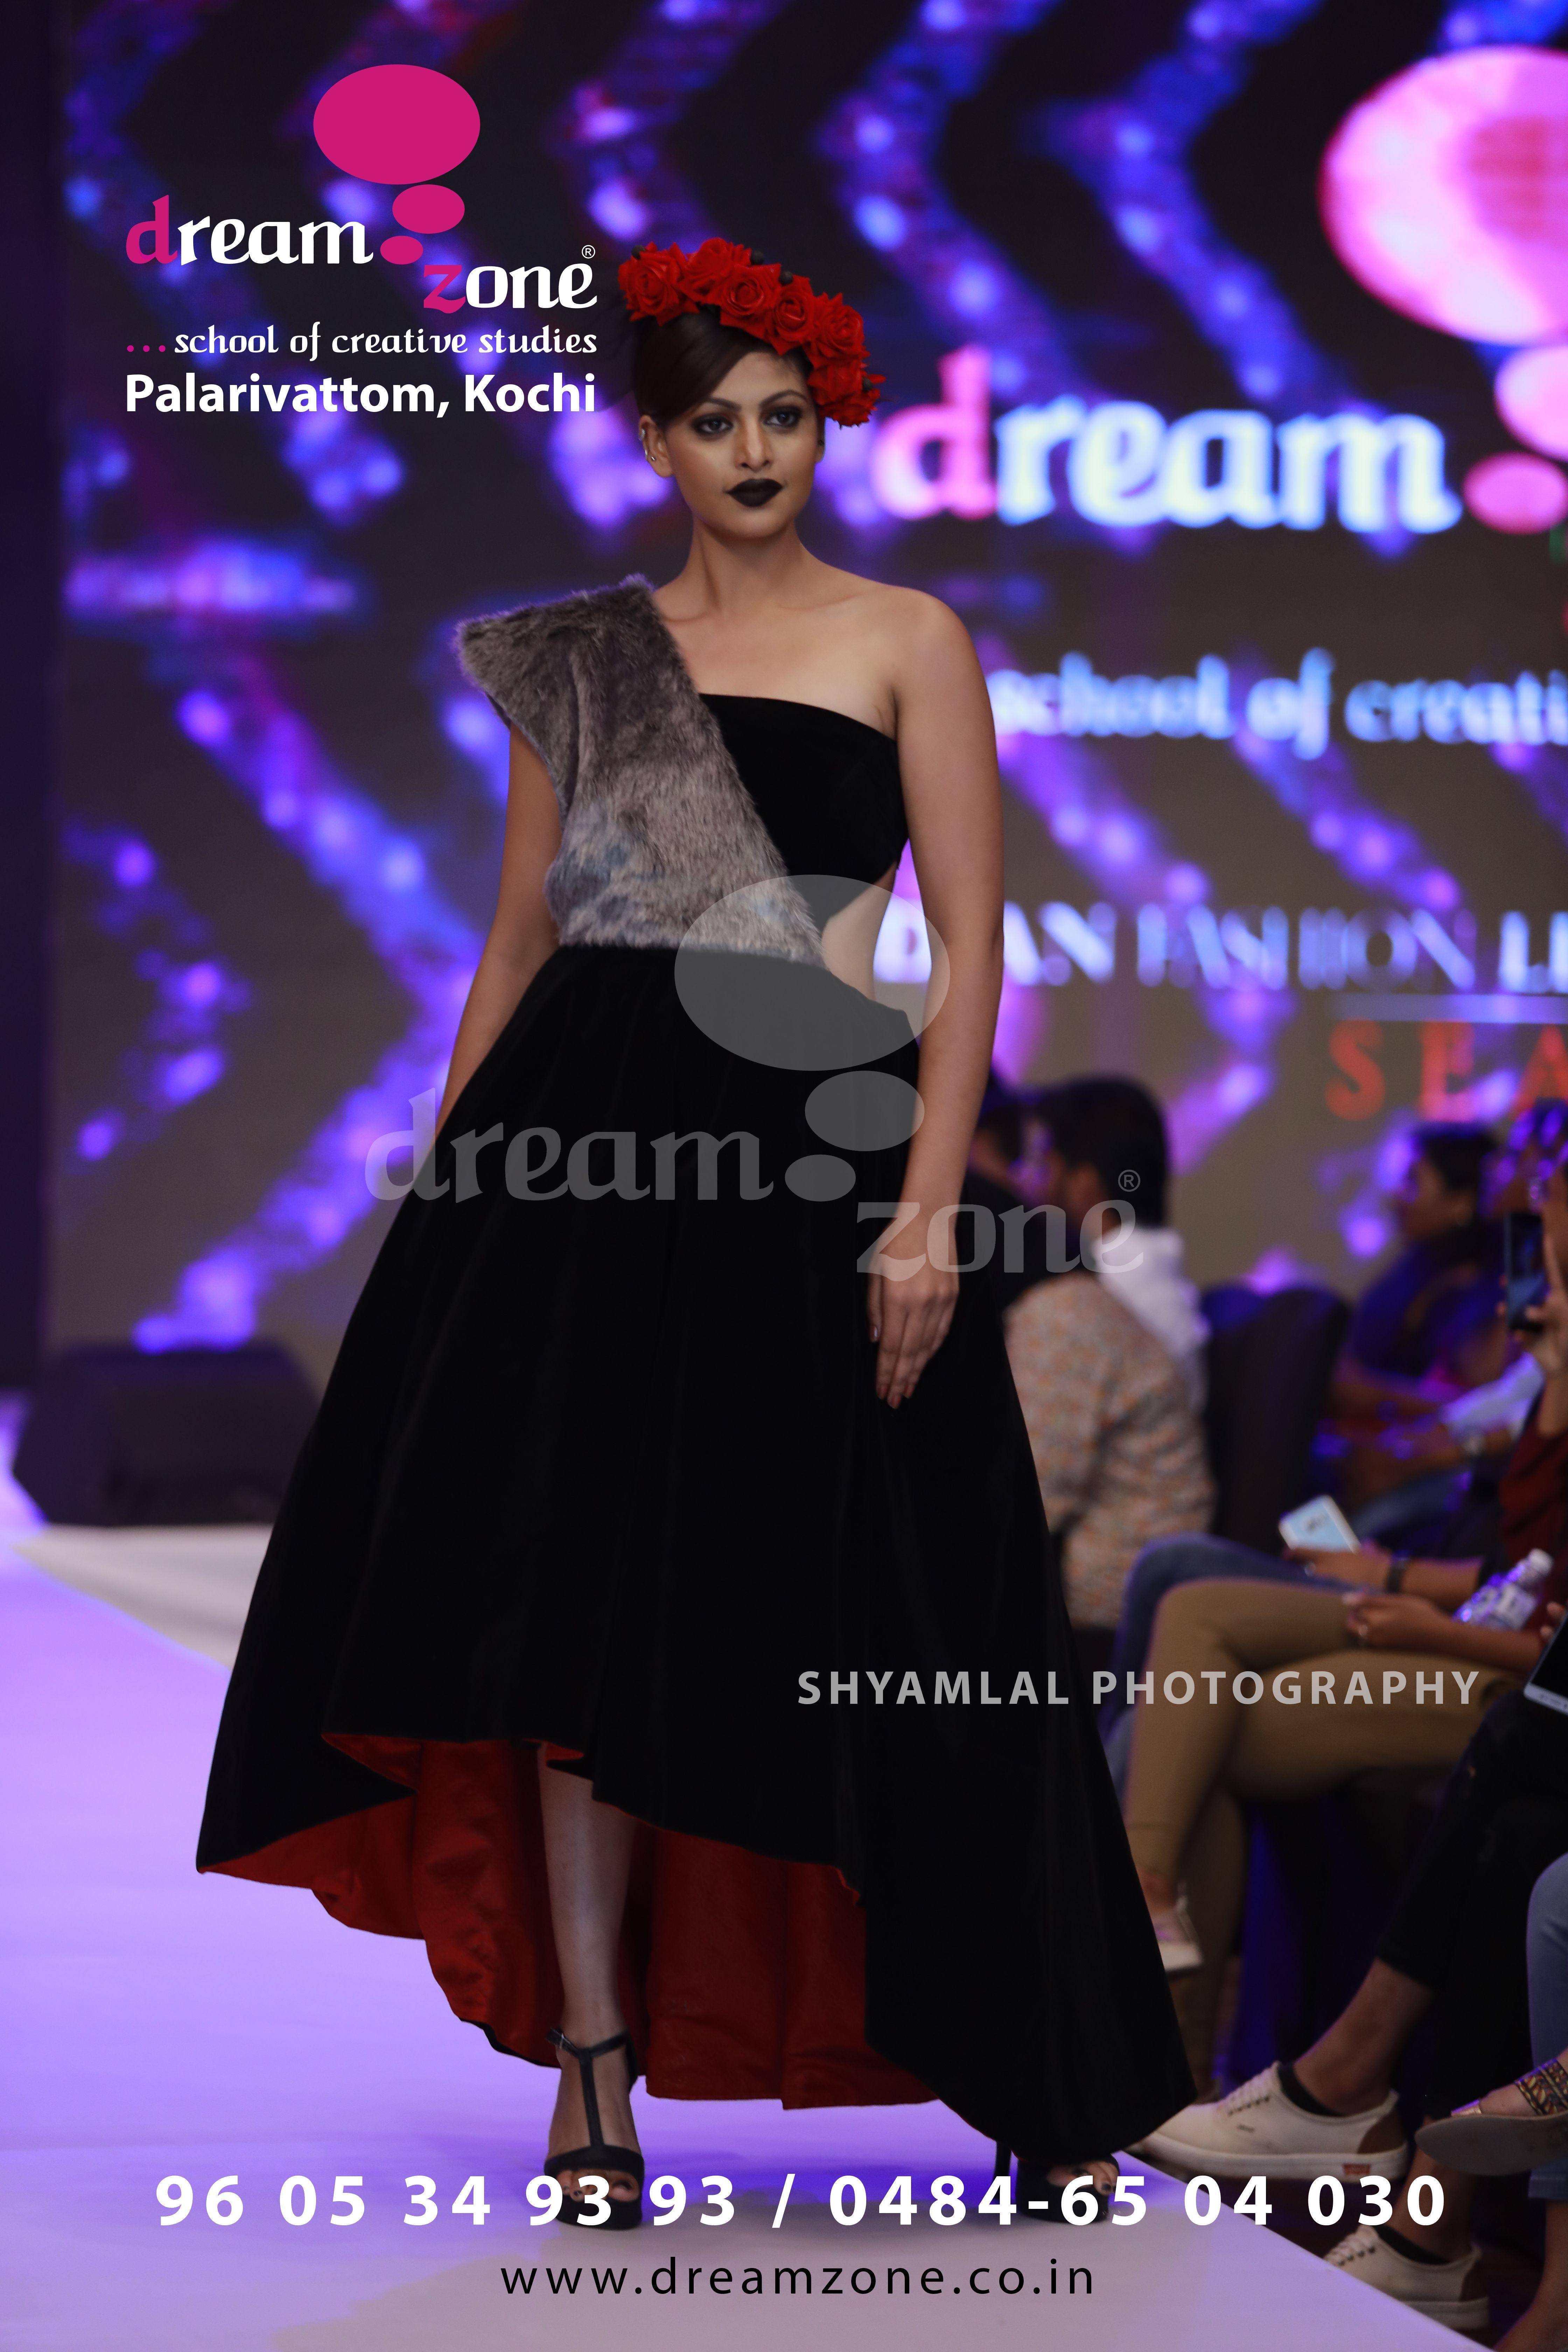 About Us Dreamzone Is A Creative Skill Development Initiative Of Cadd Centre Training Services Fashion Design Graphic Design Course